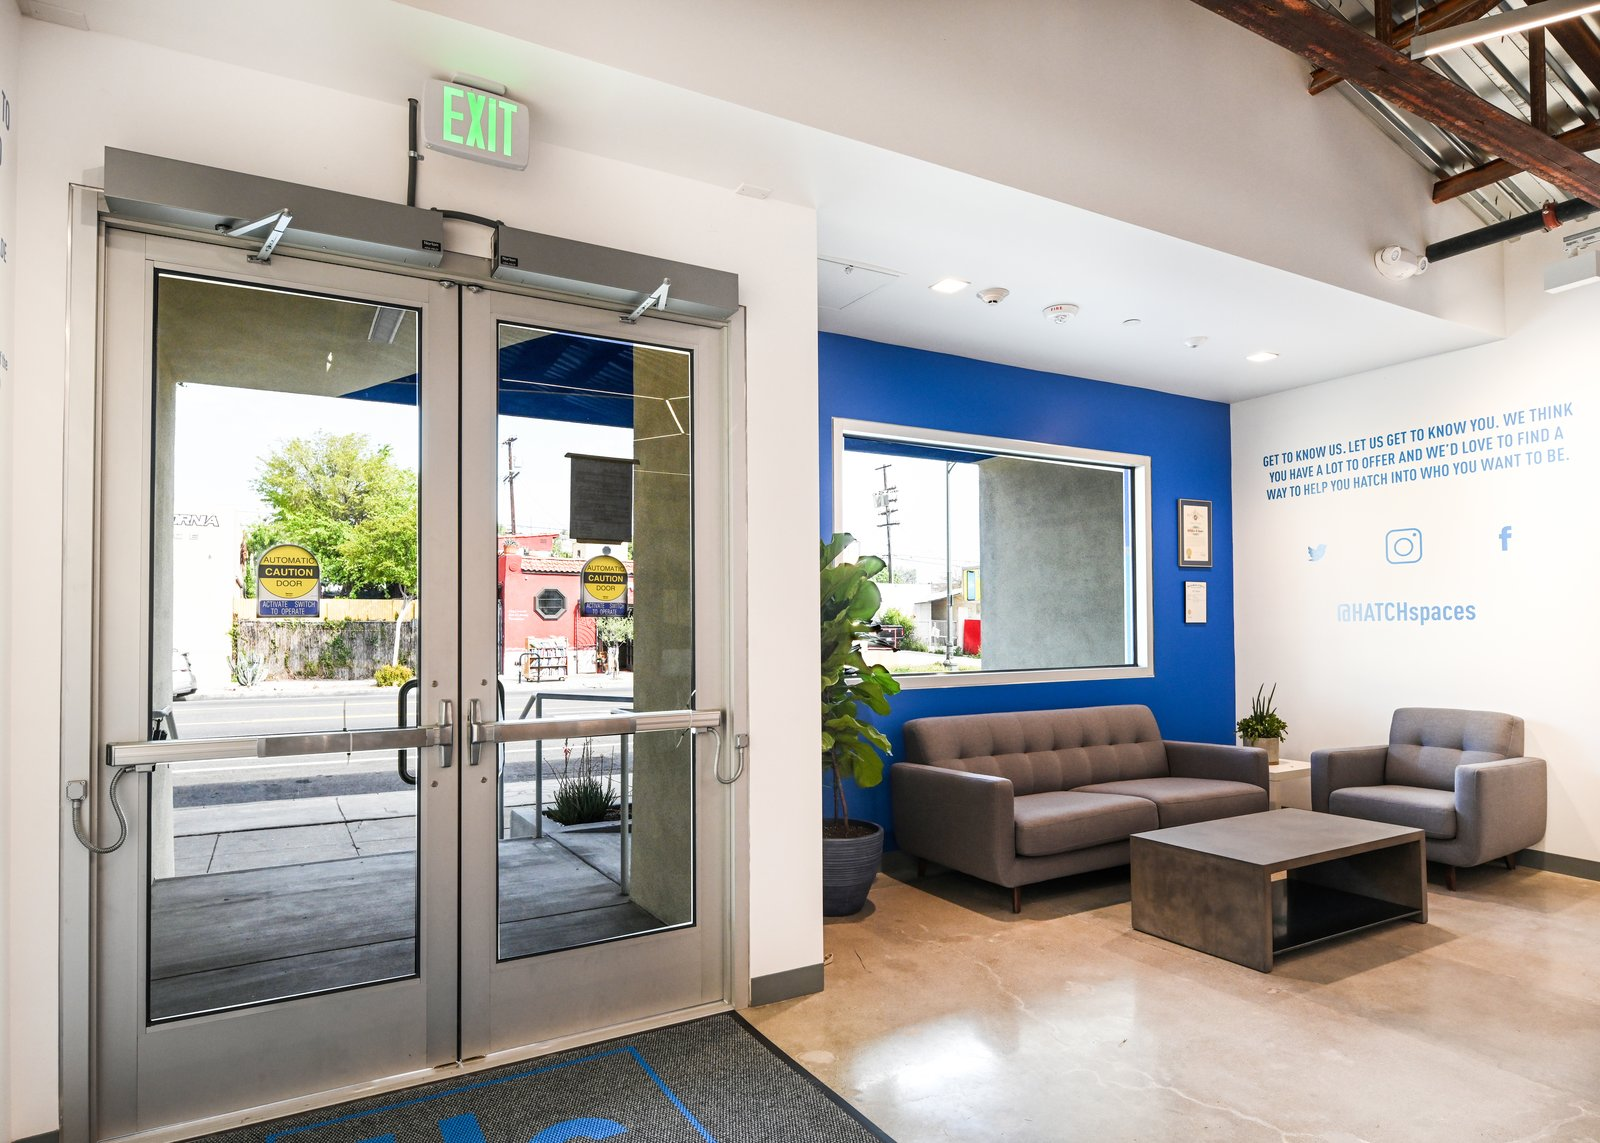 Lobby Entrance - HATCHlabs @LA Bioscience HUB  HATCHlabs @LA Bioscience HUB